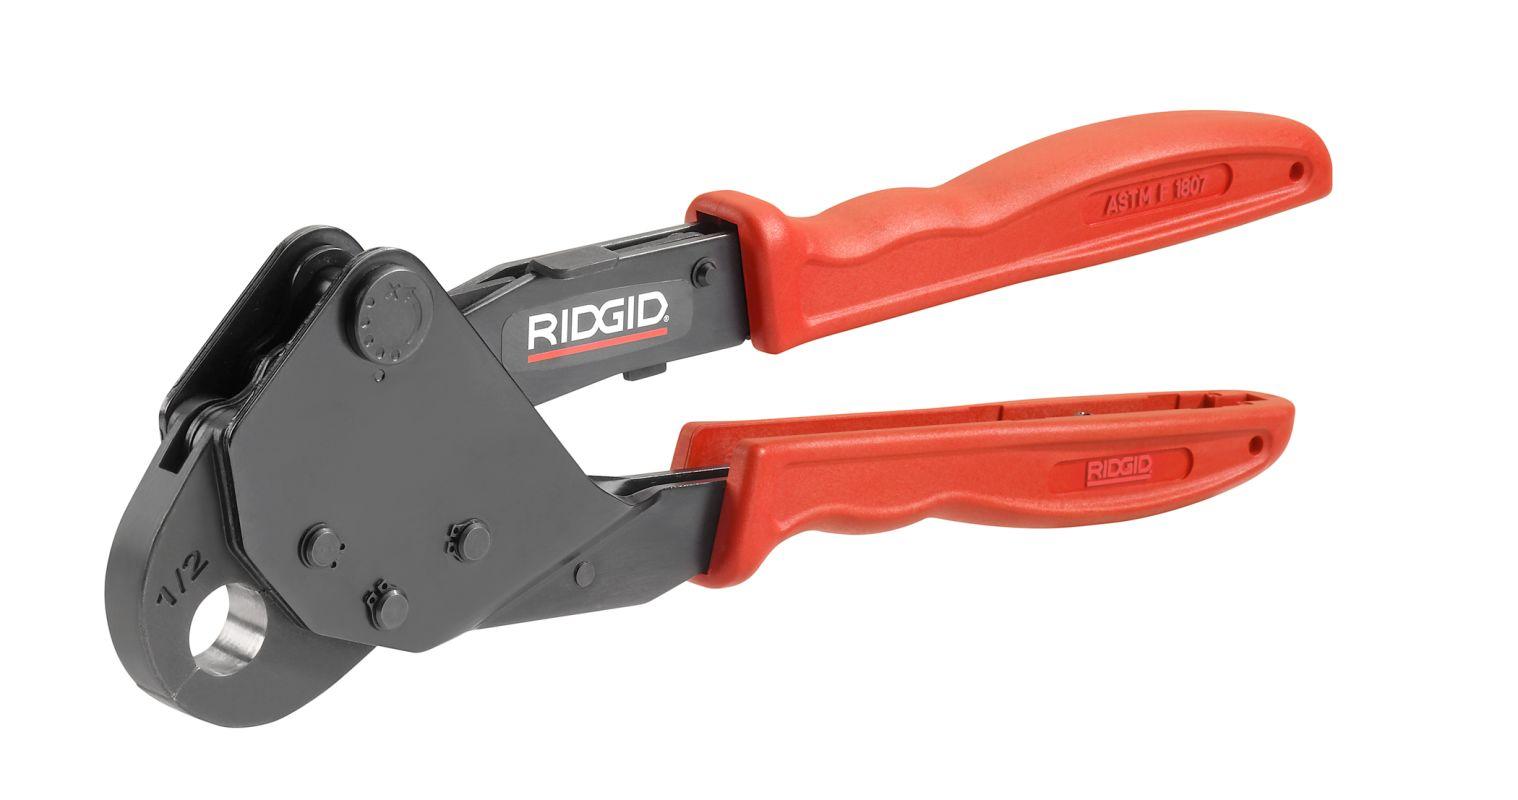 Platinum Tools 12515C Tele-Titan 10Gig Modular Crimp Tool for RJ45 Connectors